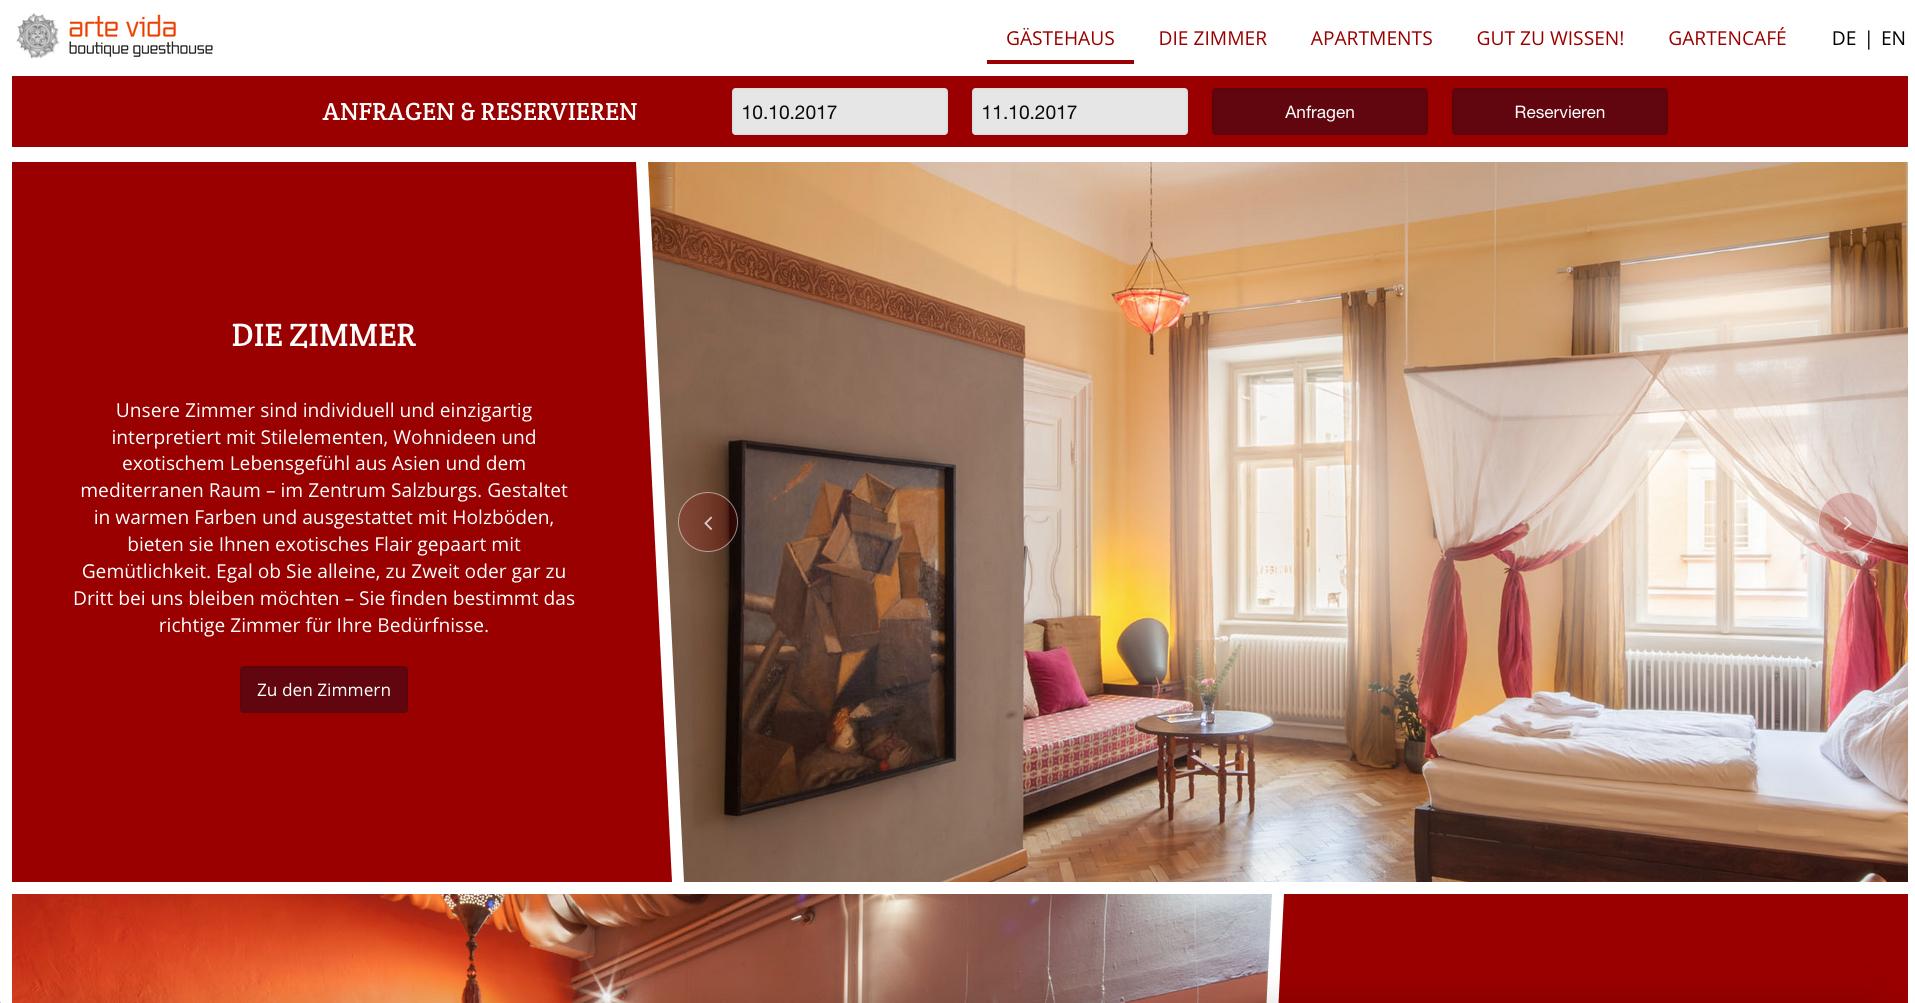 Fresh Herbs Communications Marketing Projektmanagement Website Salzburg_38_arte vida boutique guesthouse